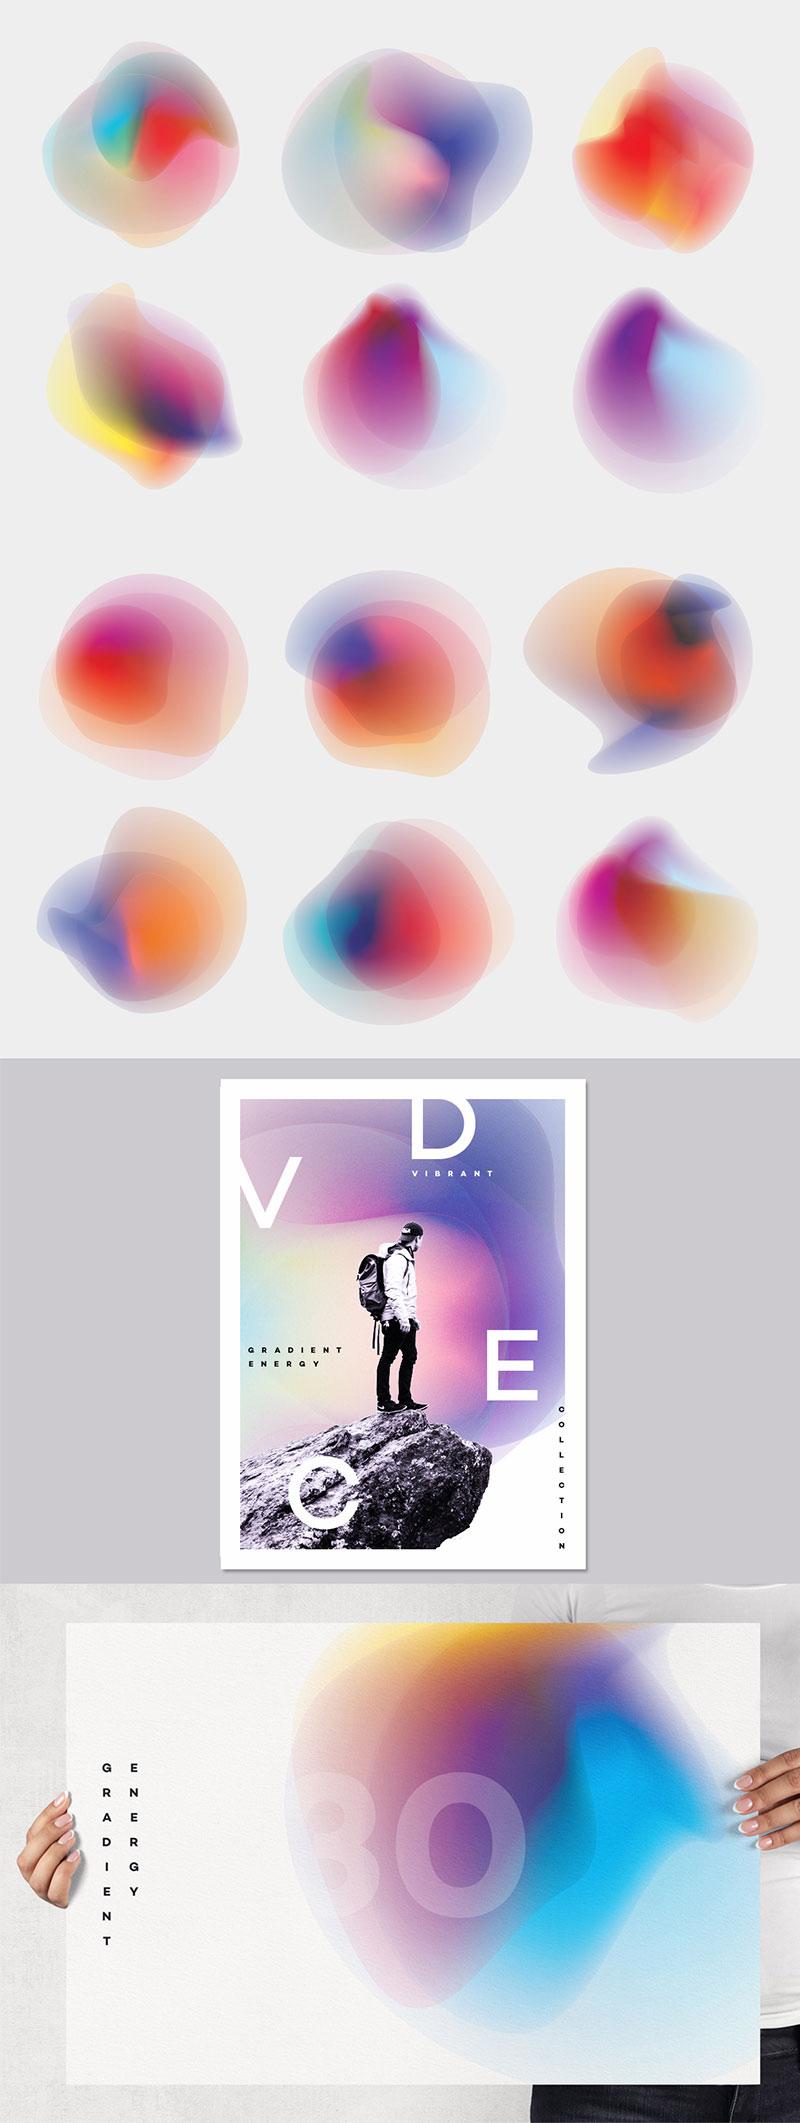 gradient-energy-vibrant-shapes1